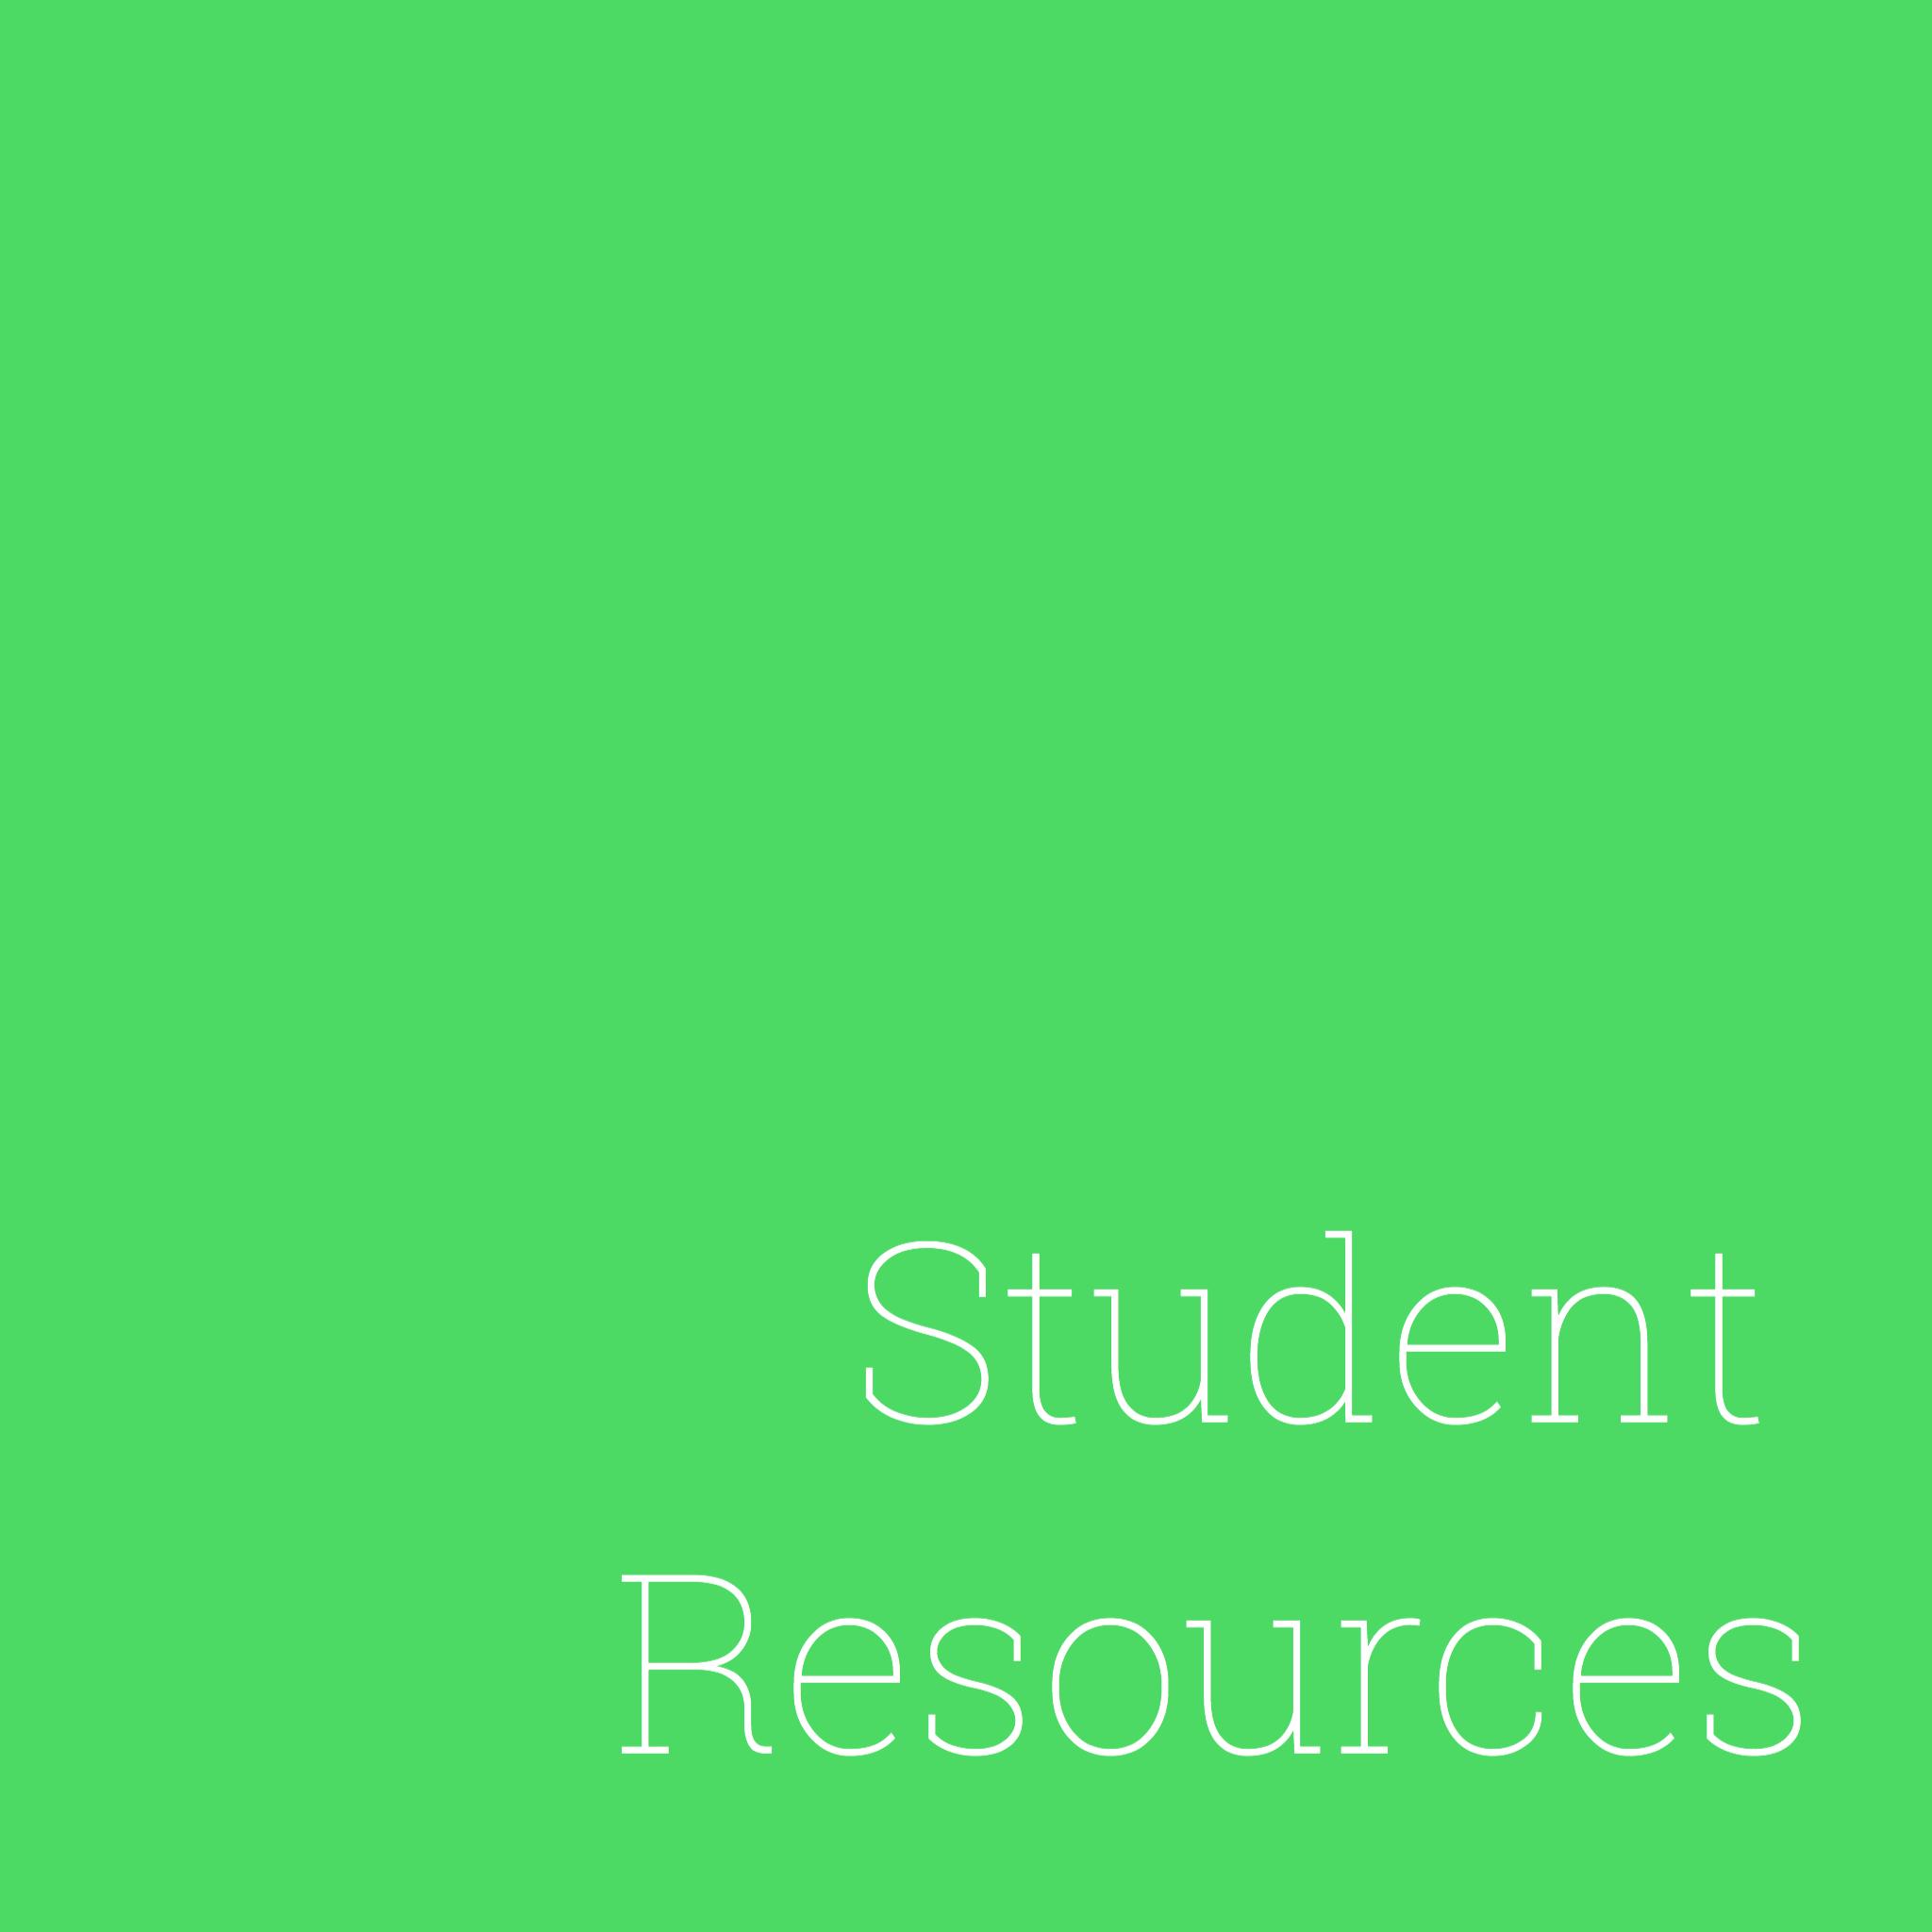 Information Booklet, study plans, Student Communication Proforma, Learner Self-Assessment